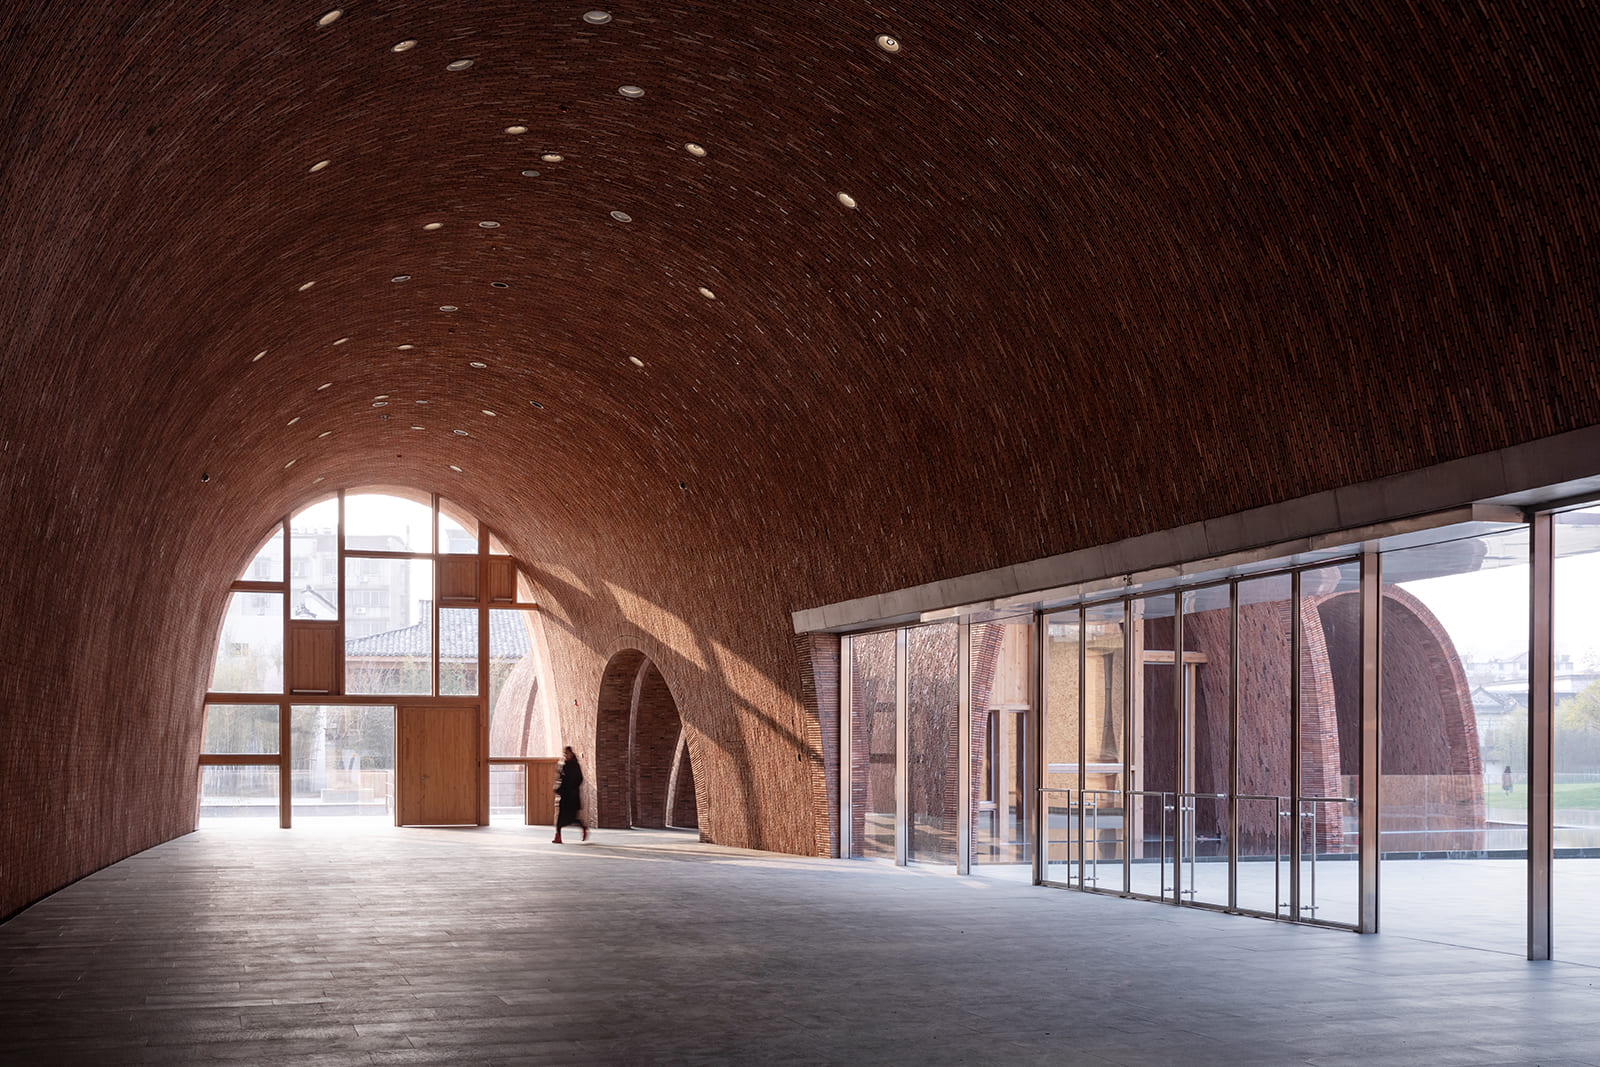 Imperial Kiln Museum in Jingdezhen  - 6.1 ©schranimage 1 45